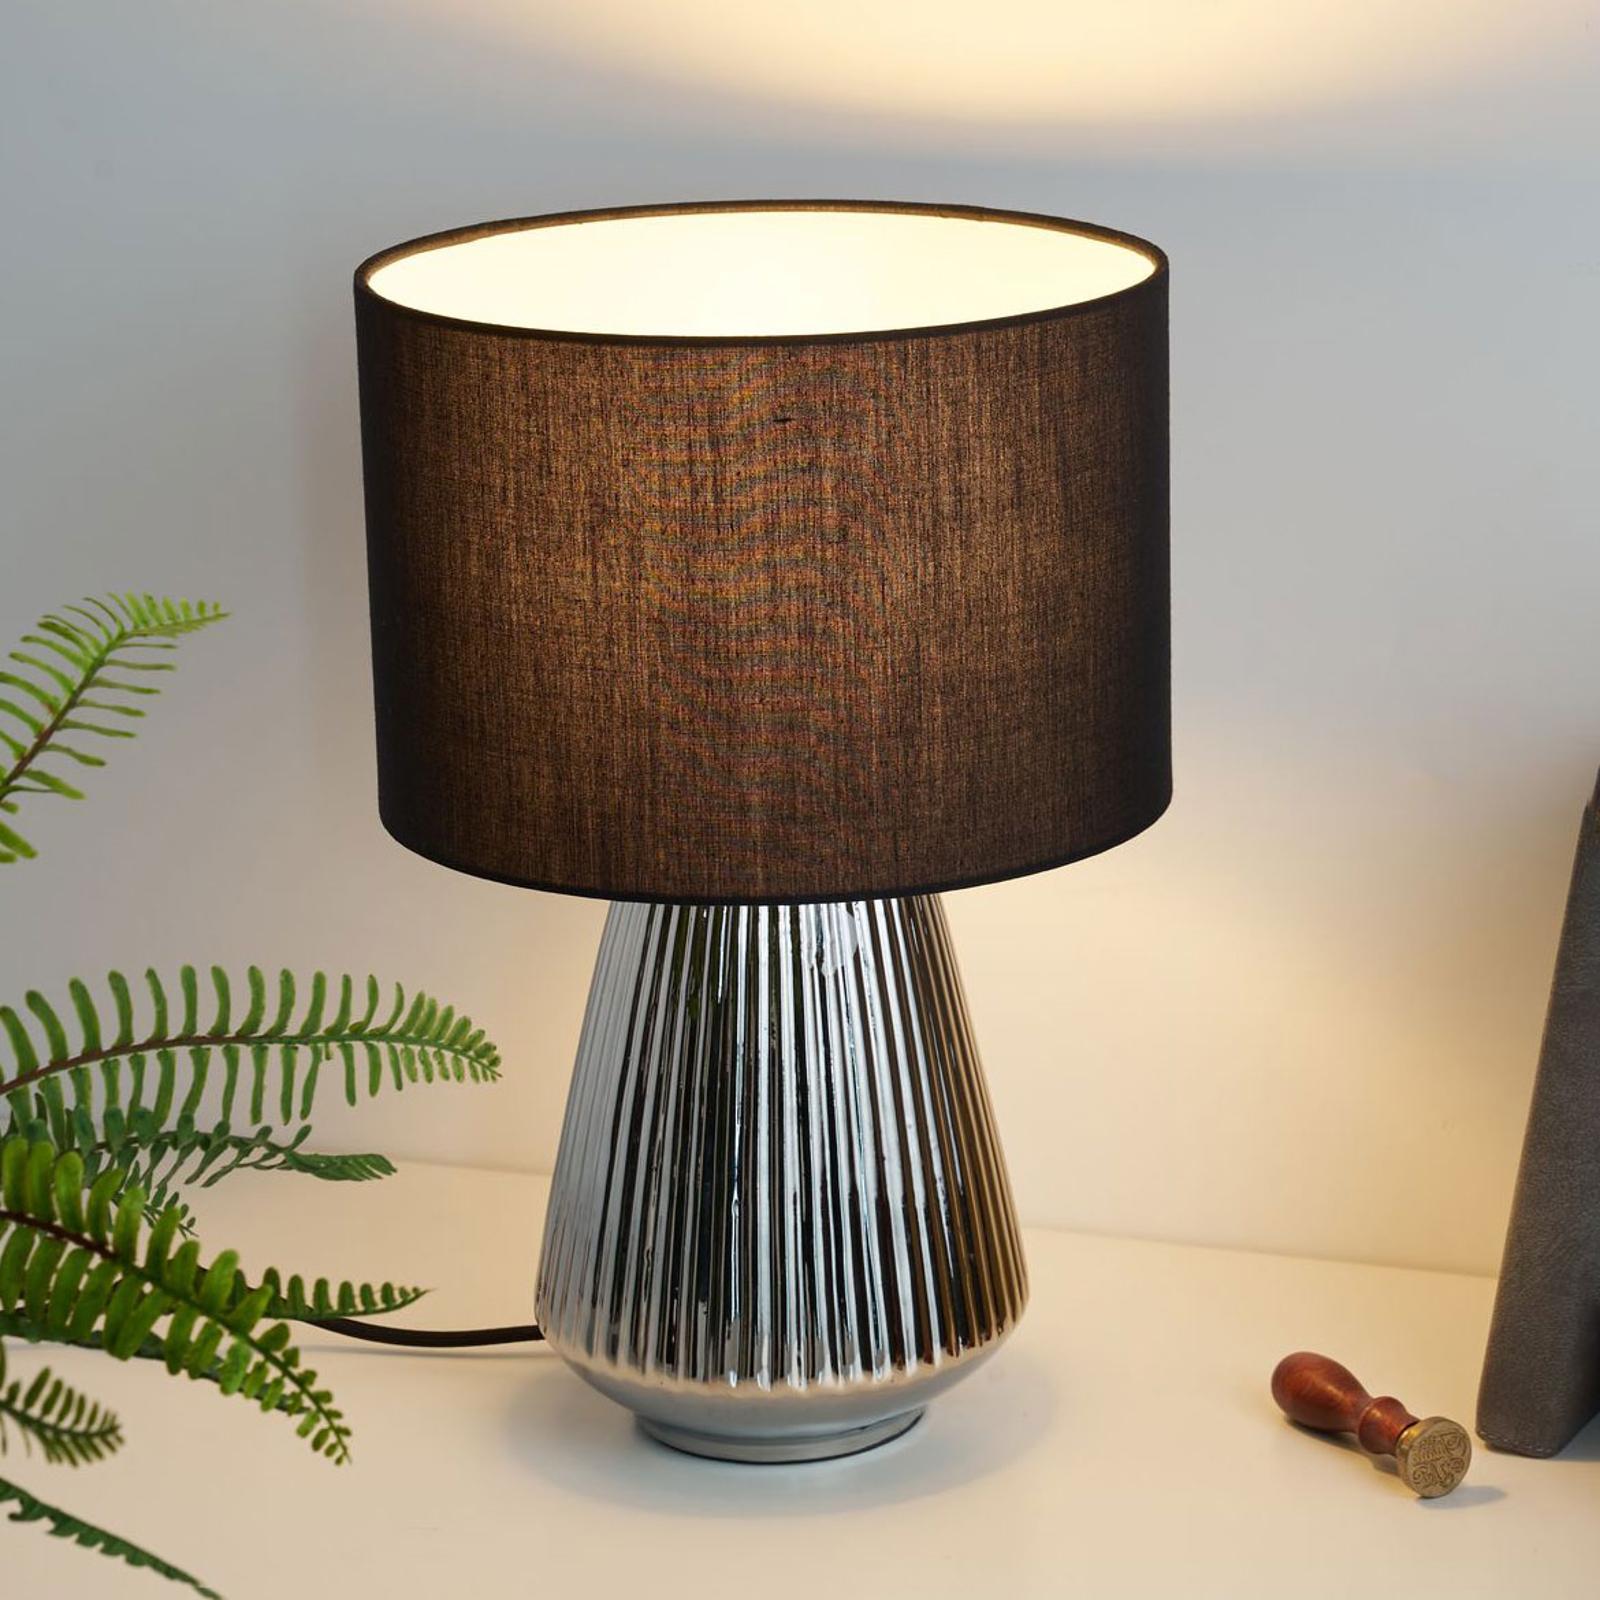 Pauleen Toss of Silver Tischlampe mit Keramikfuß